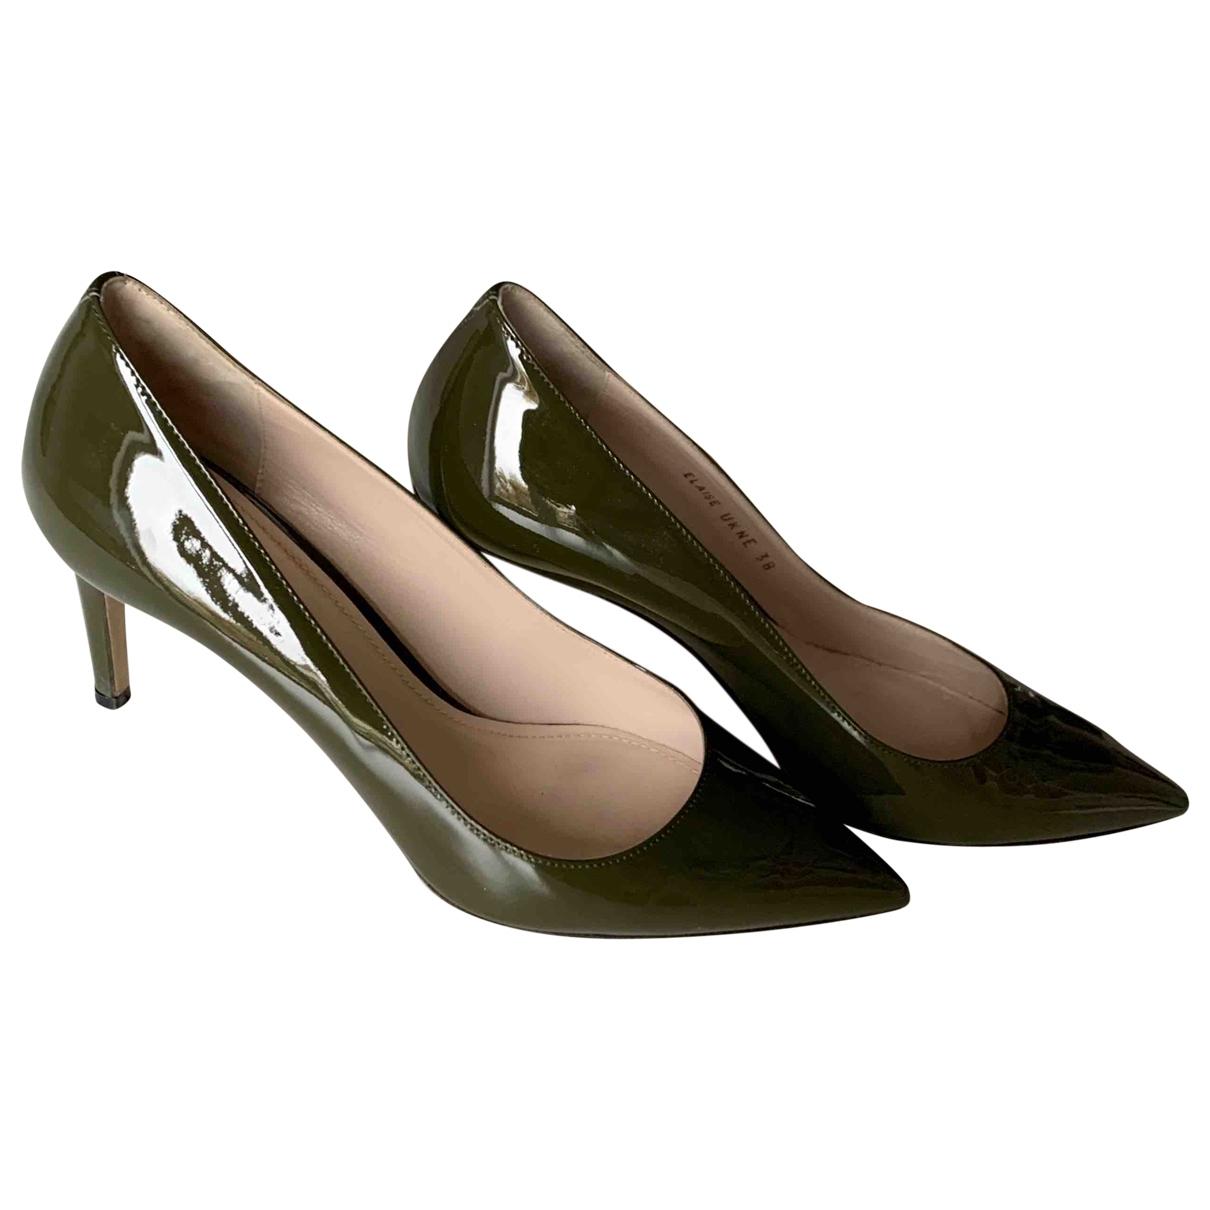 Bally - Escarpins   pour femme en cuir verni - vert